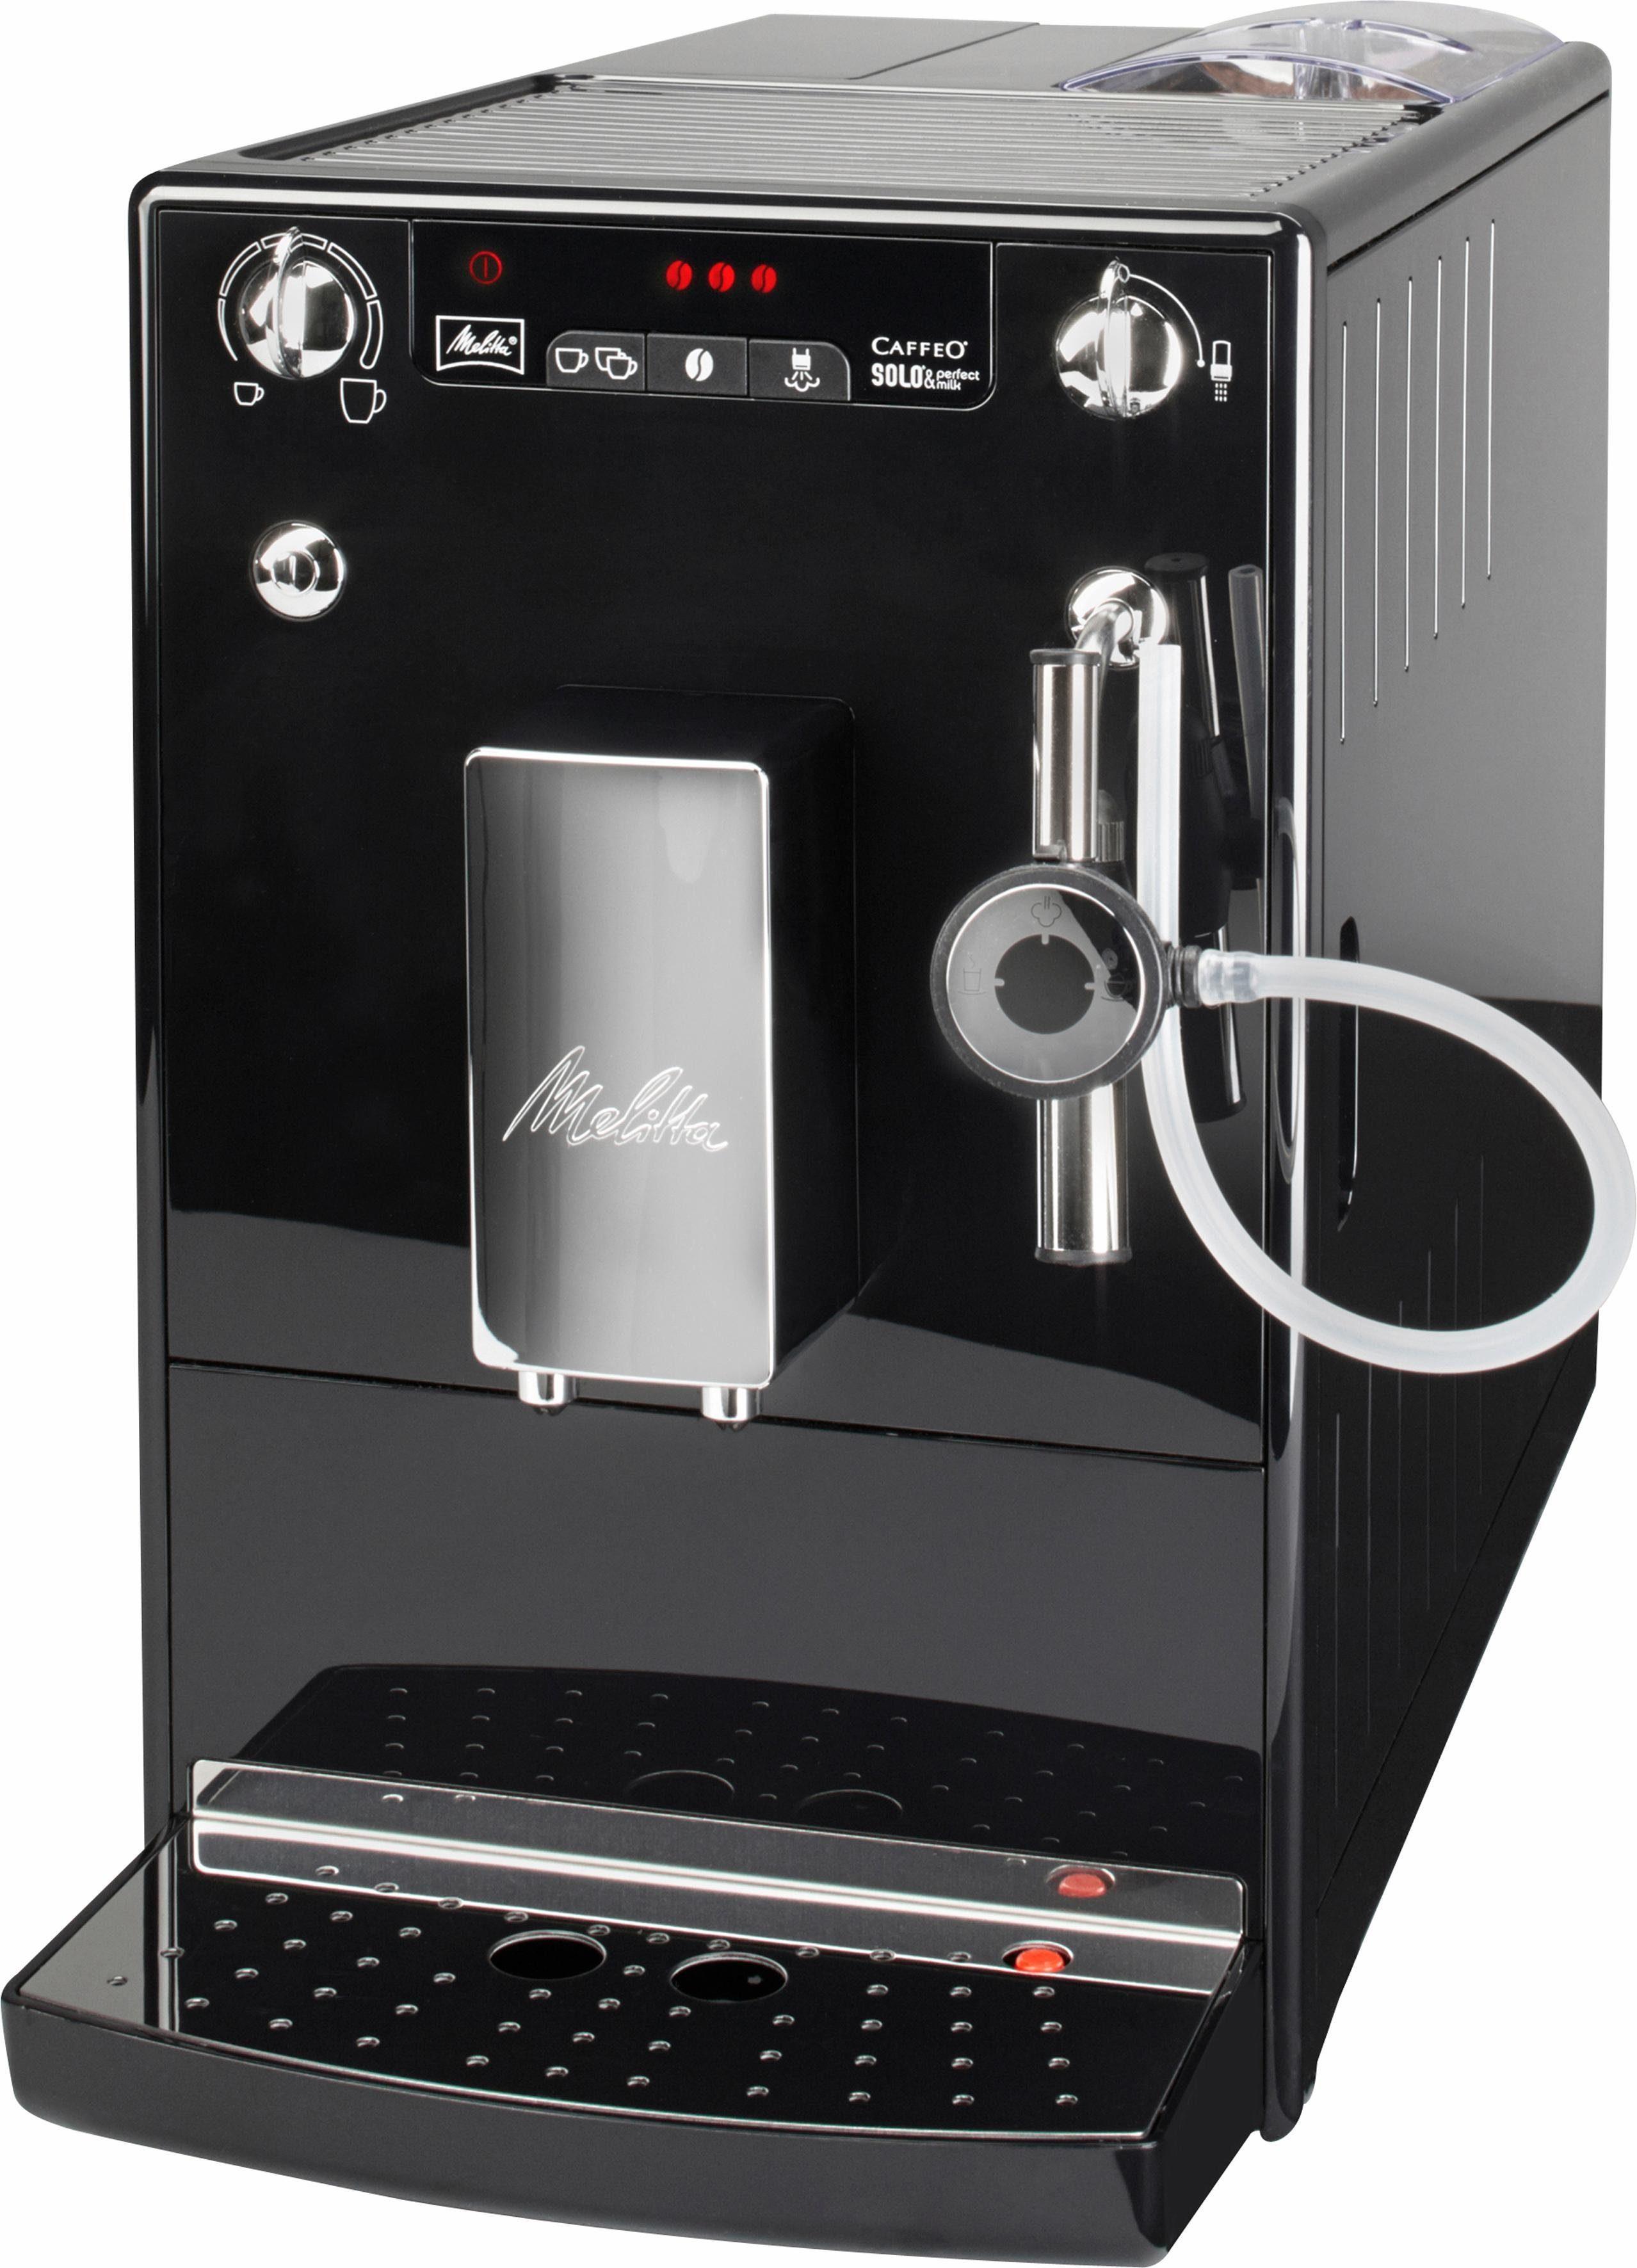 Melitta Kaffeevollautomat CAFFEO® Solo® & Perfect Milk E 957-101, 1,2l Tank, Kegelmahlwerk, nur 20 cm breit